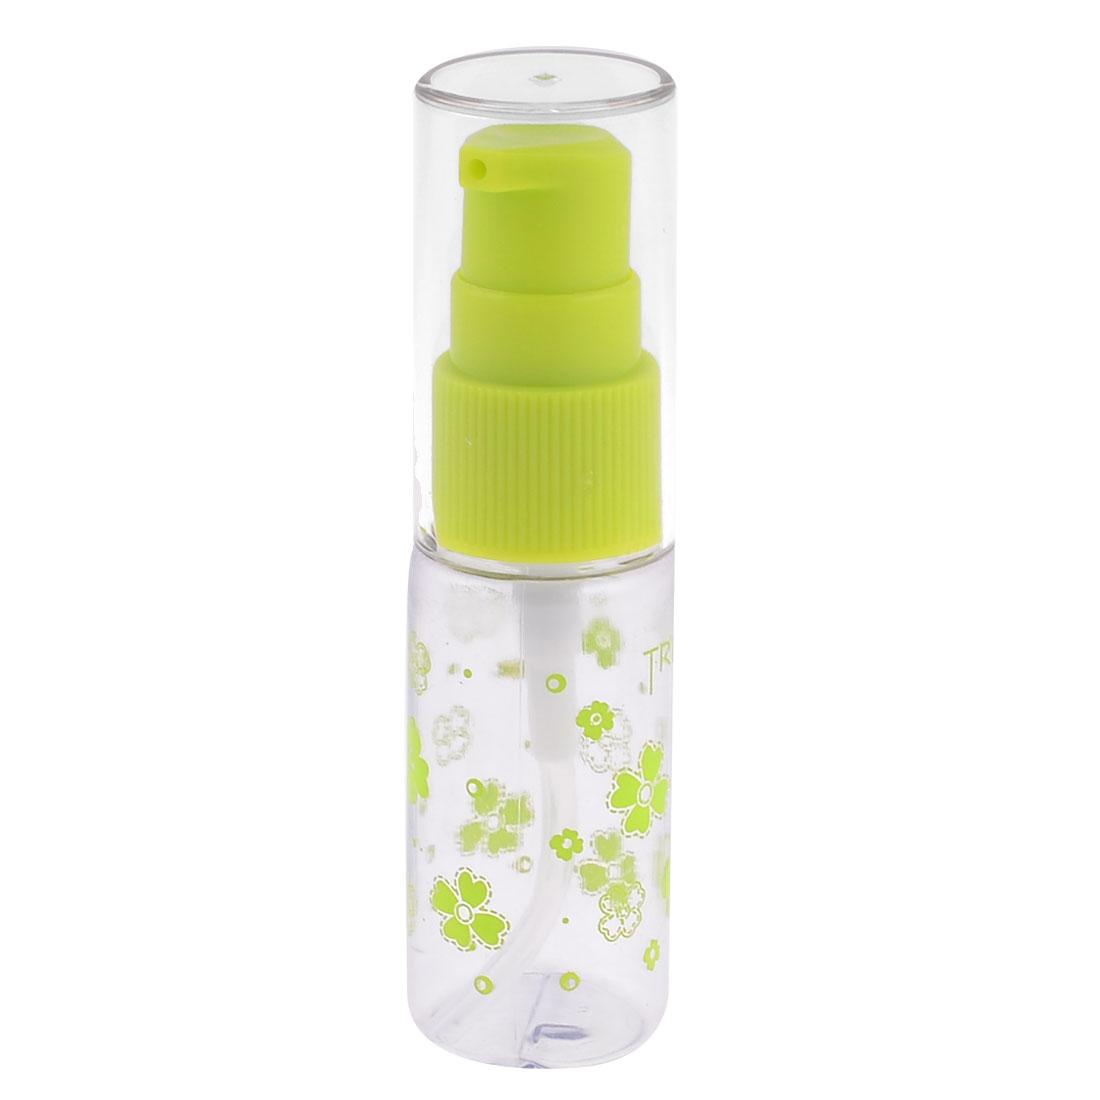 Women Flower Print Green Yellow Plastic Liquid Cosmetic Spray Bottle Holder 15cc